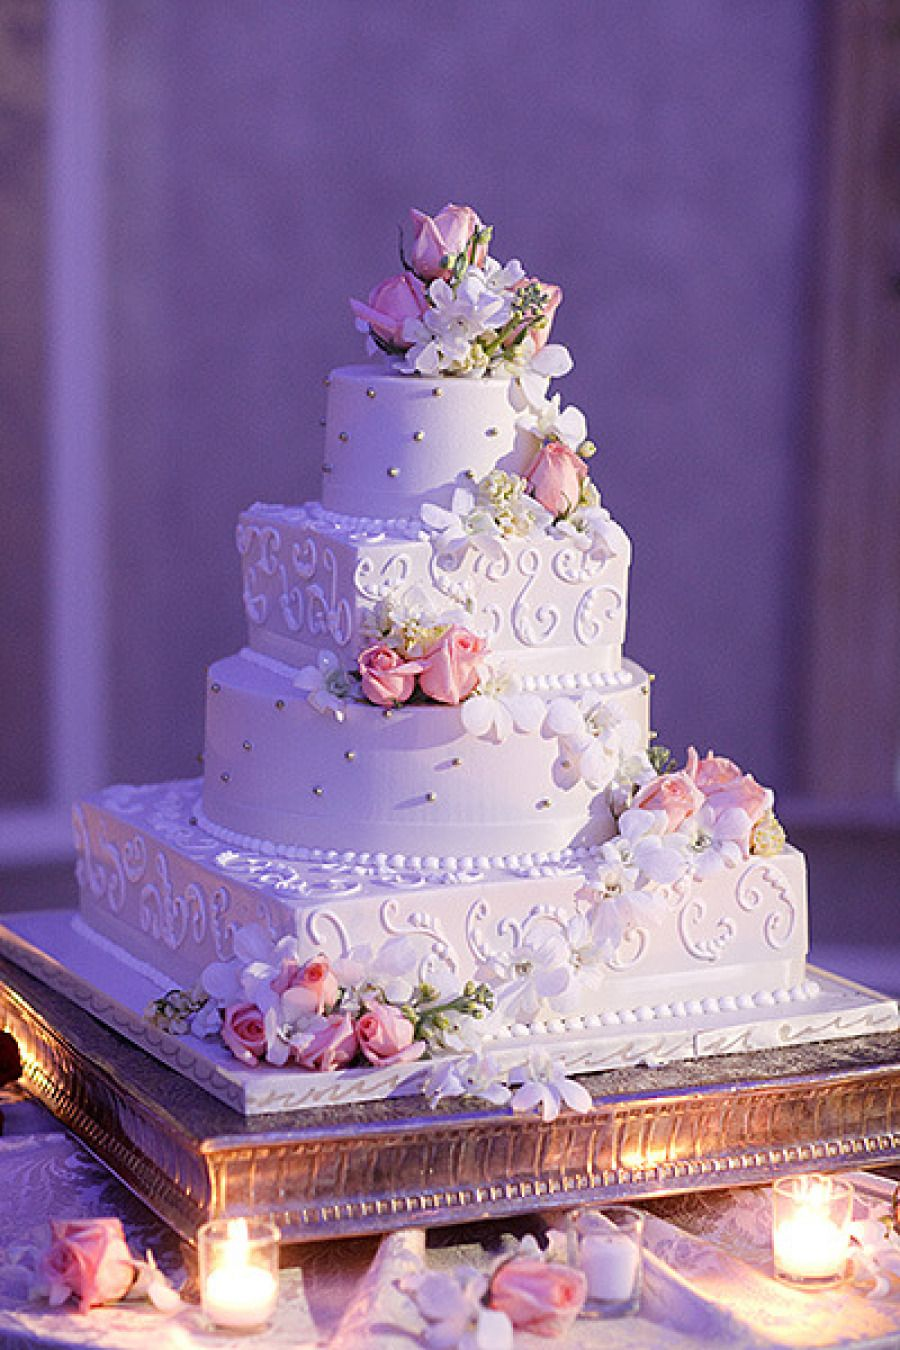 25 jaw dropping beautiful wedding cake ideas perfeita bolinhos e 25 jaw dropping beautiful wedding cake ideas modwedding junglespirit Choice Image